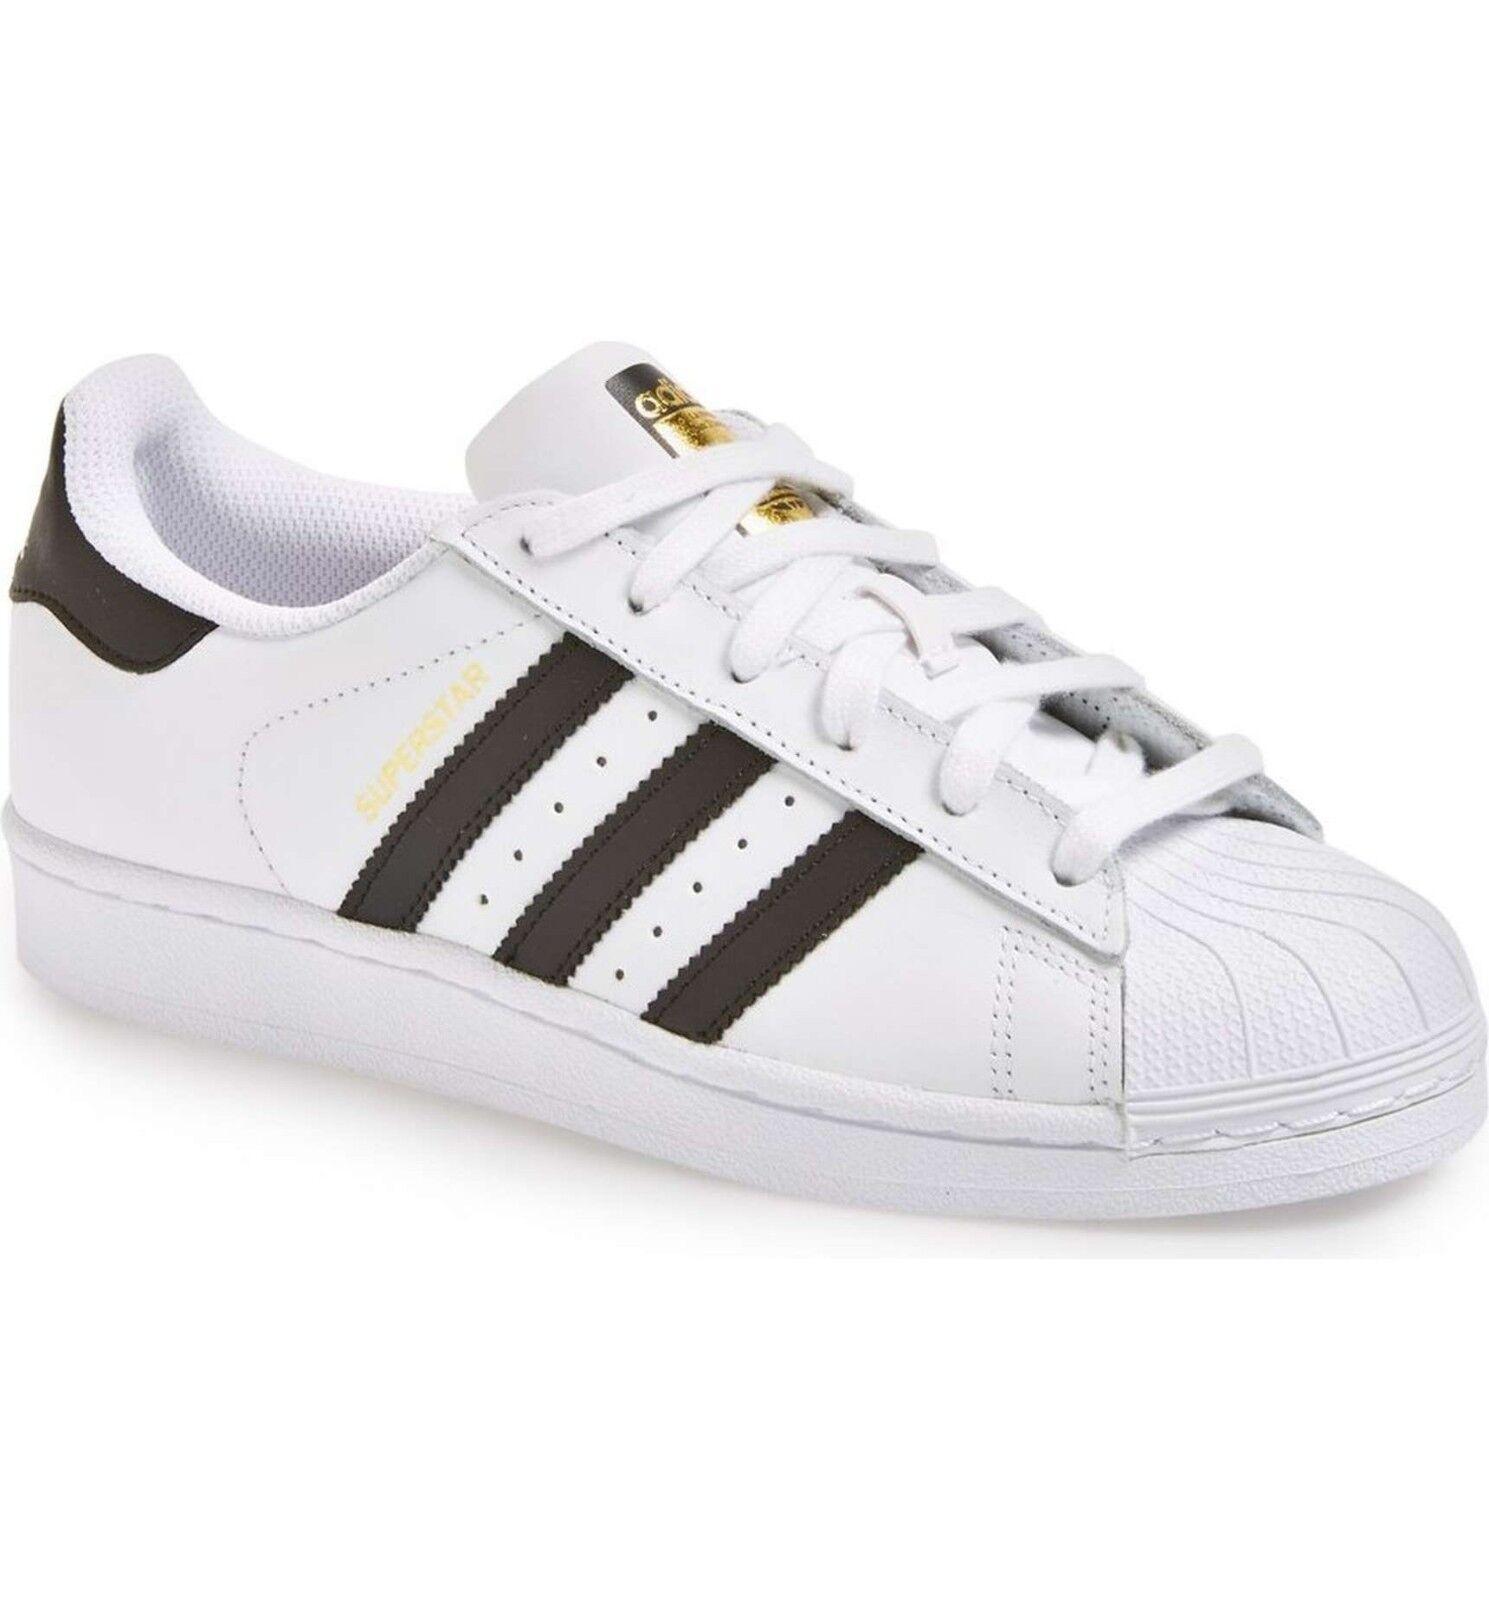 Adidas superstar 7.5/ scarpe taglia Uomo dimensioni 7.5/ superstar donne misura 8,5 a1c3c9